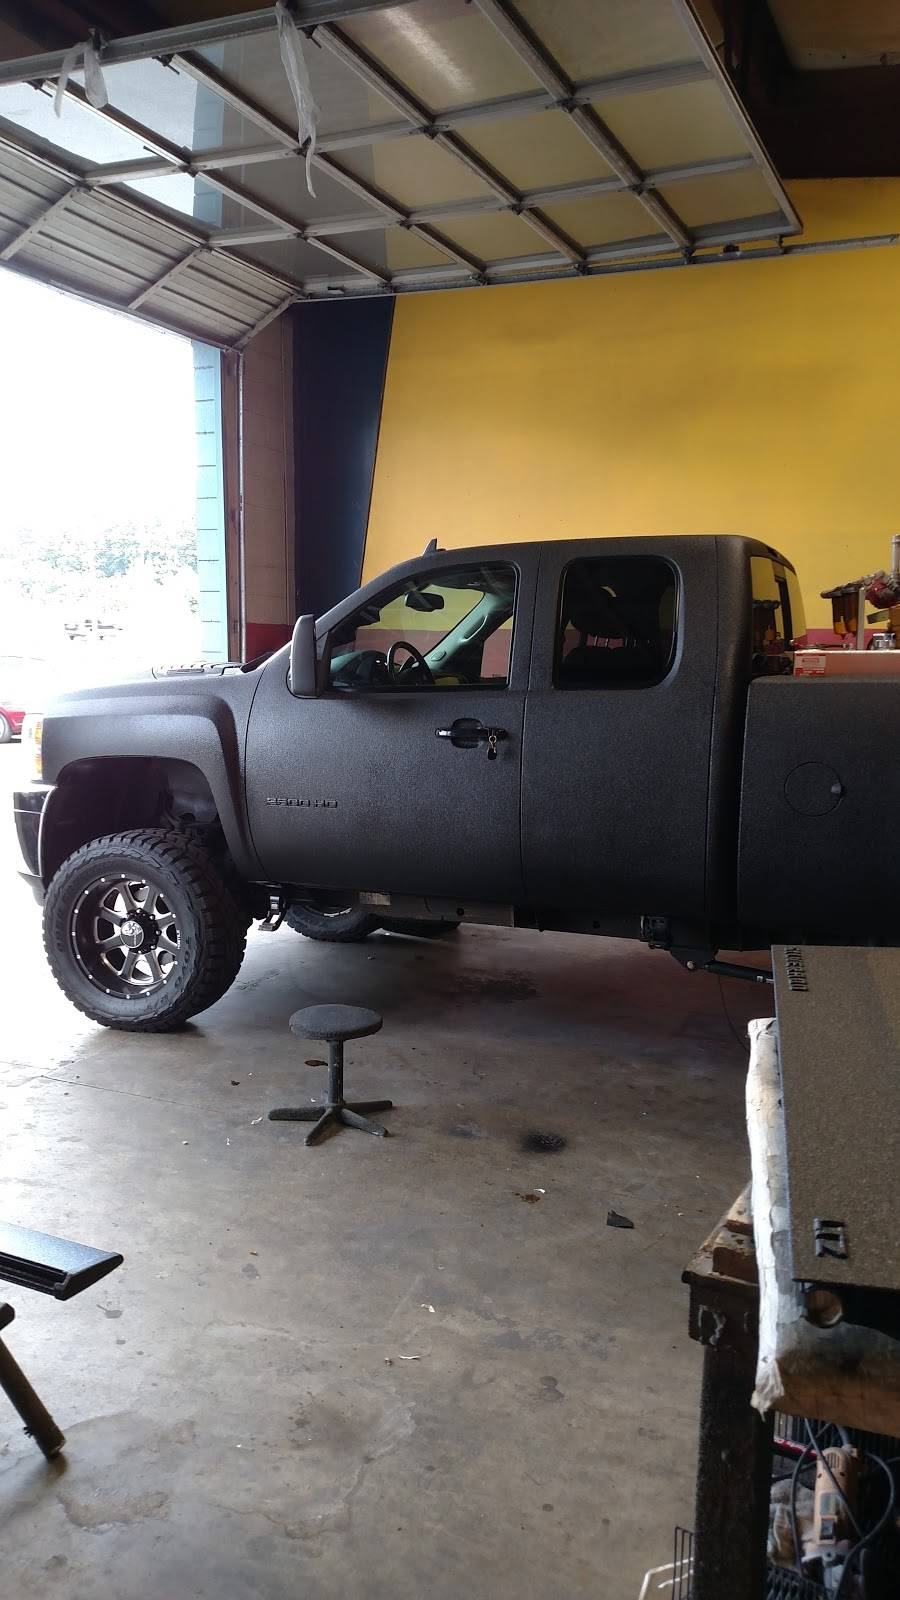 LINE-X of Winston Salem - car repair  | Photo 8 of 10 | Address: 5350 University Pkwy P, Winston-Salem, NC 27106, USA | Phone: (336) 744-5575